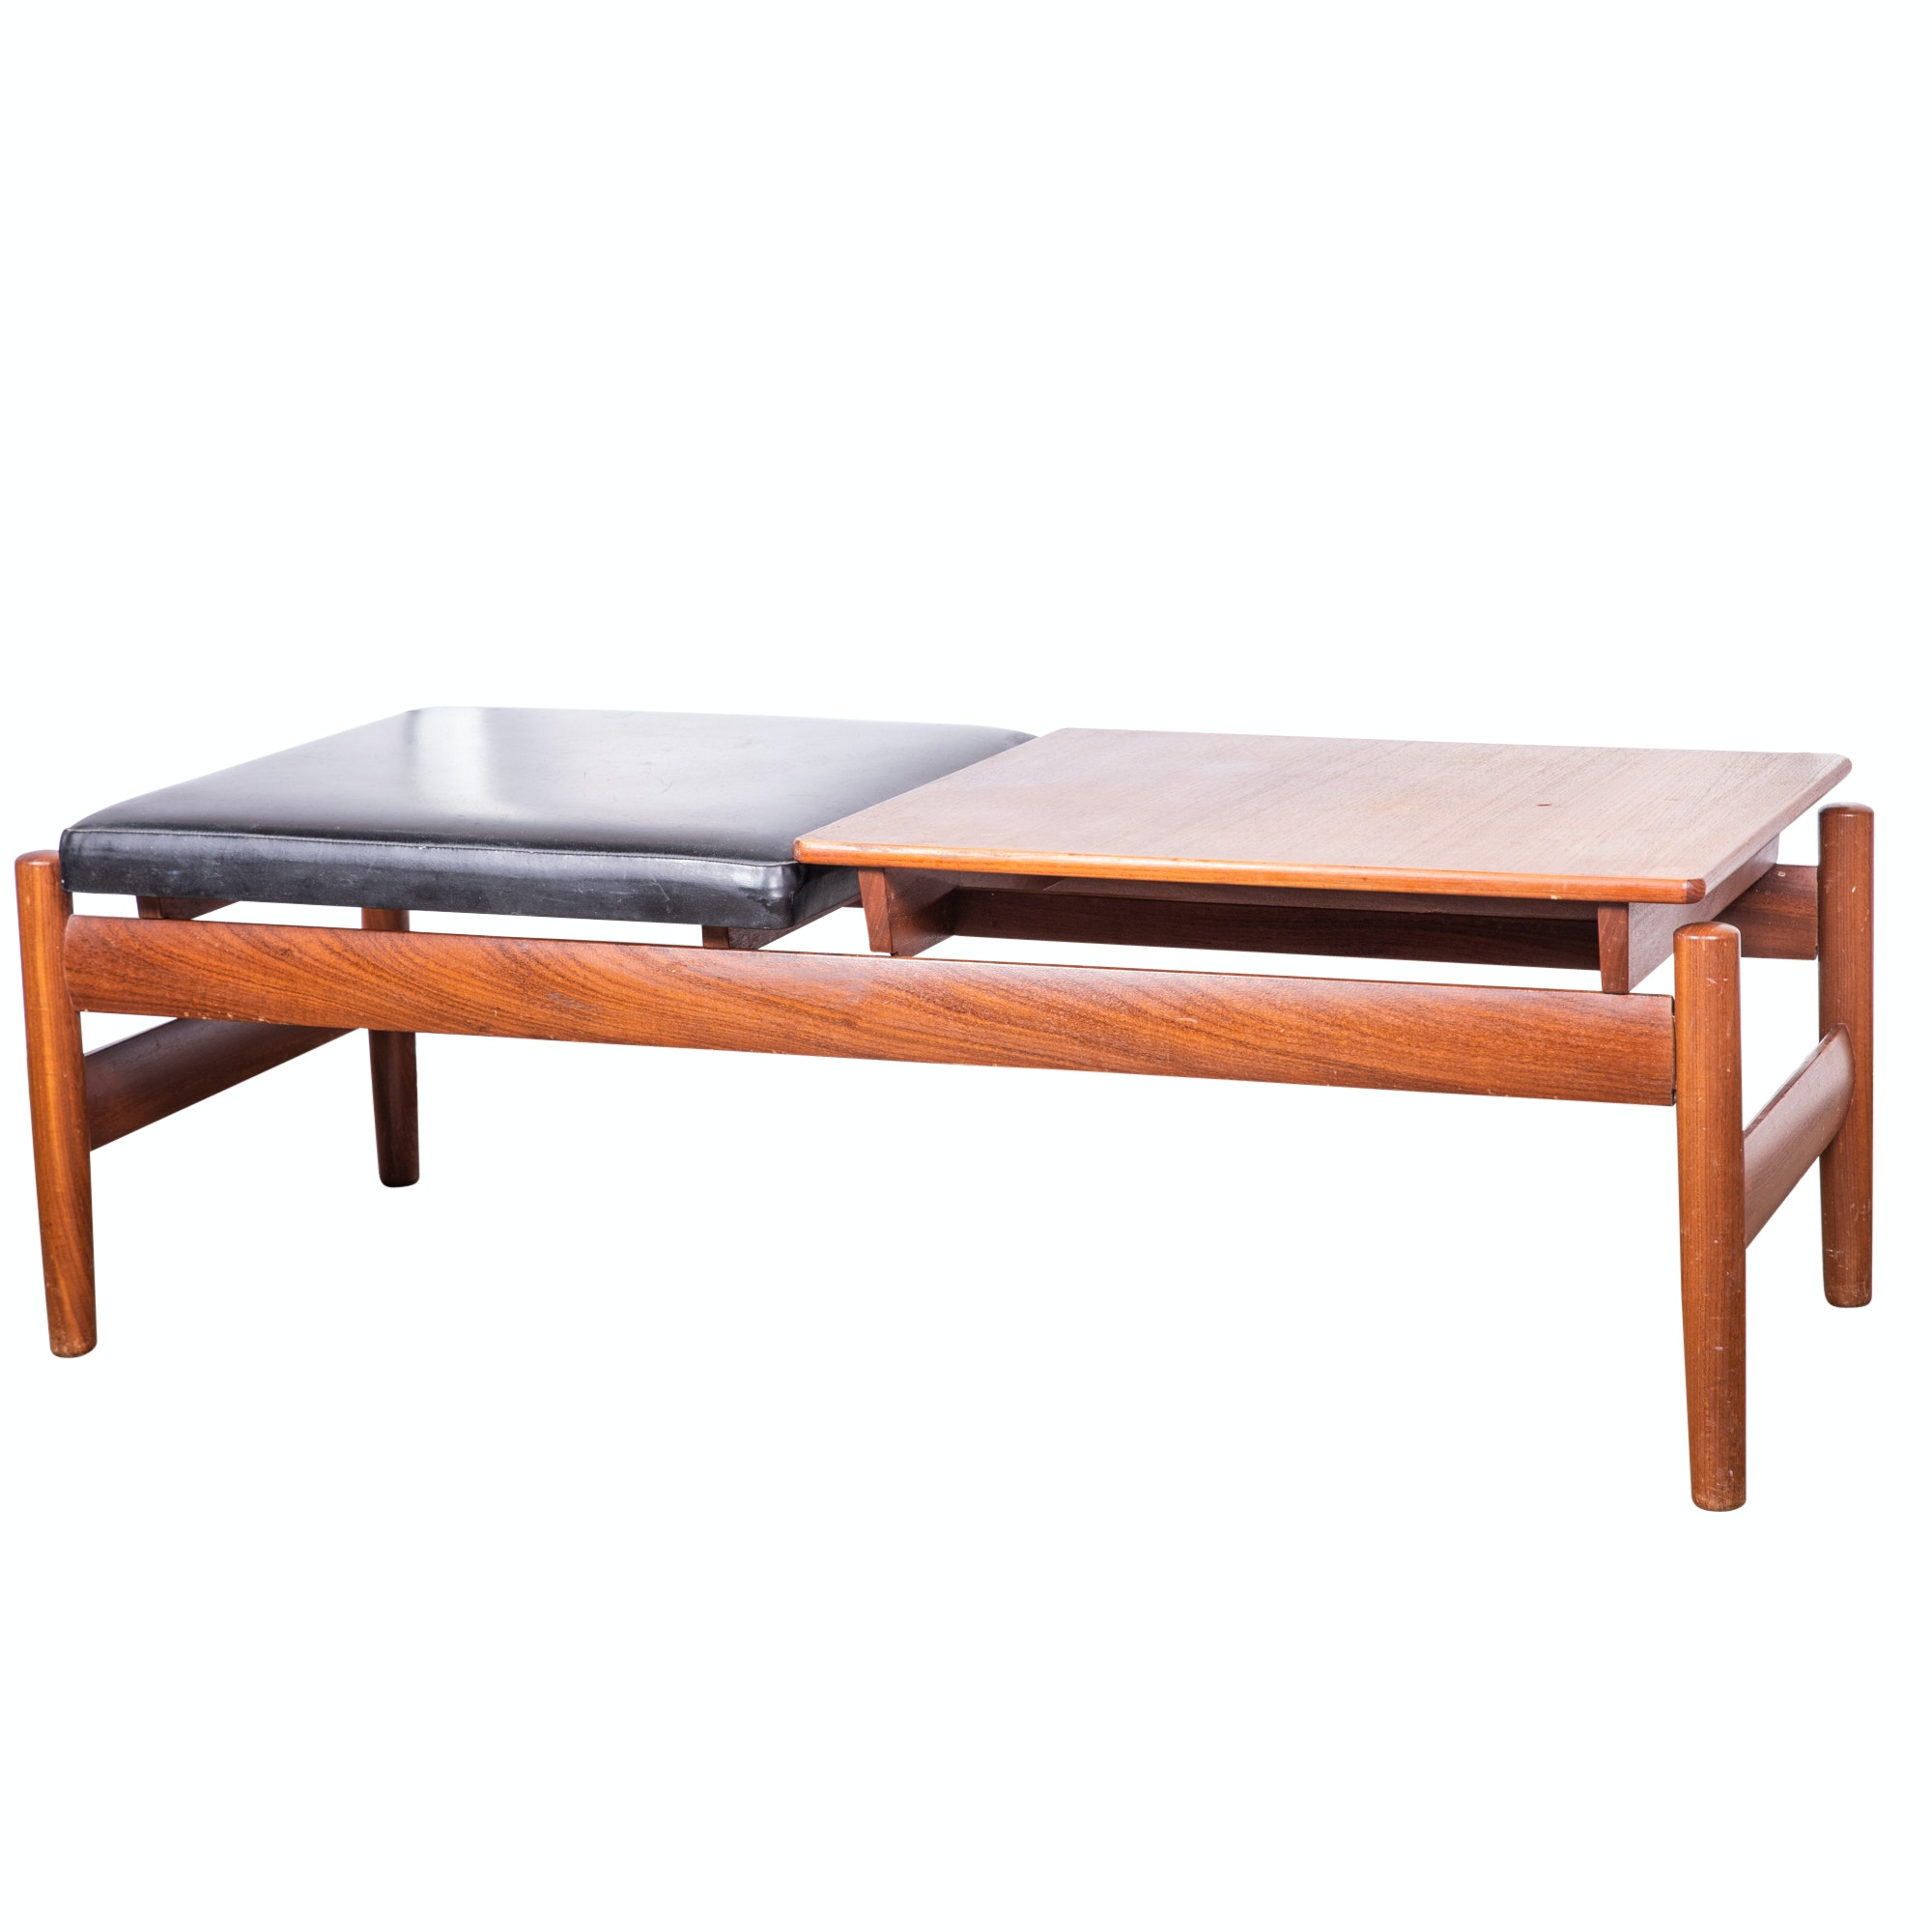 Scandinavian Modern Modular Tray Top Teak Bench by Karl Sorlie & Sonner, 20th C